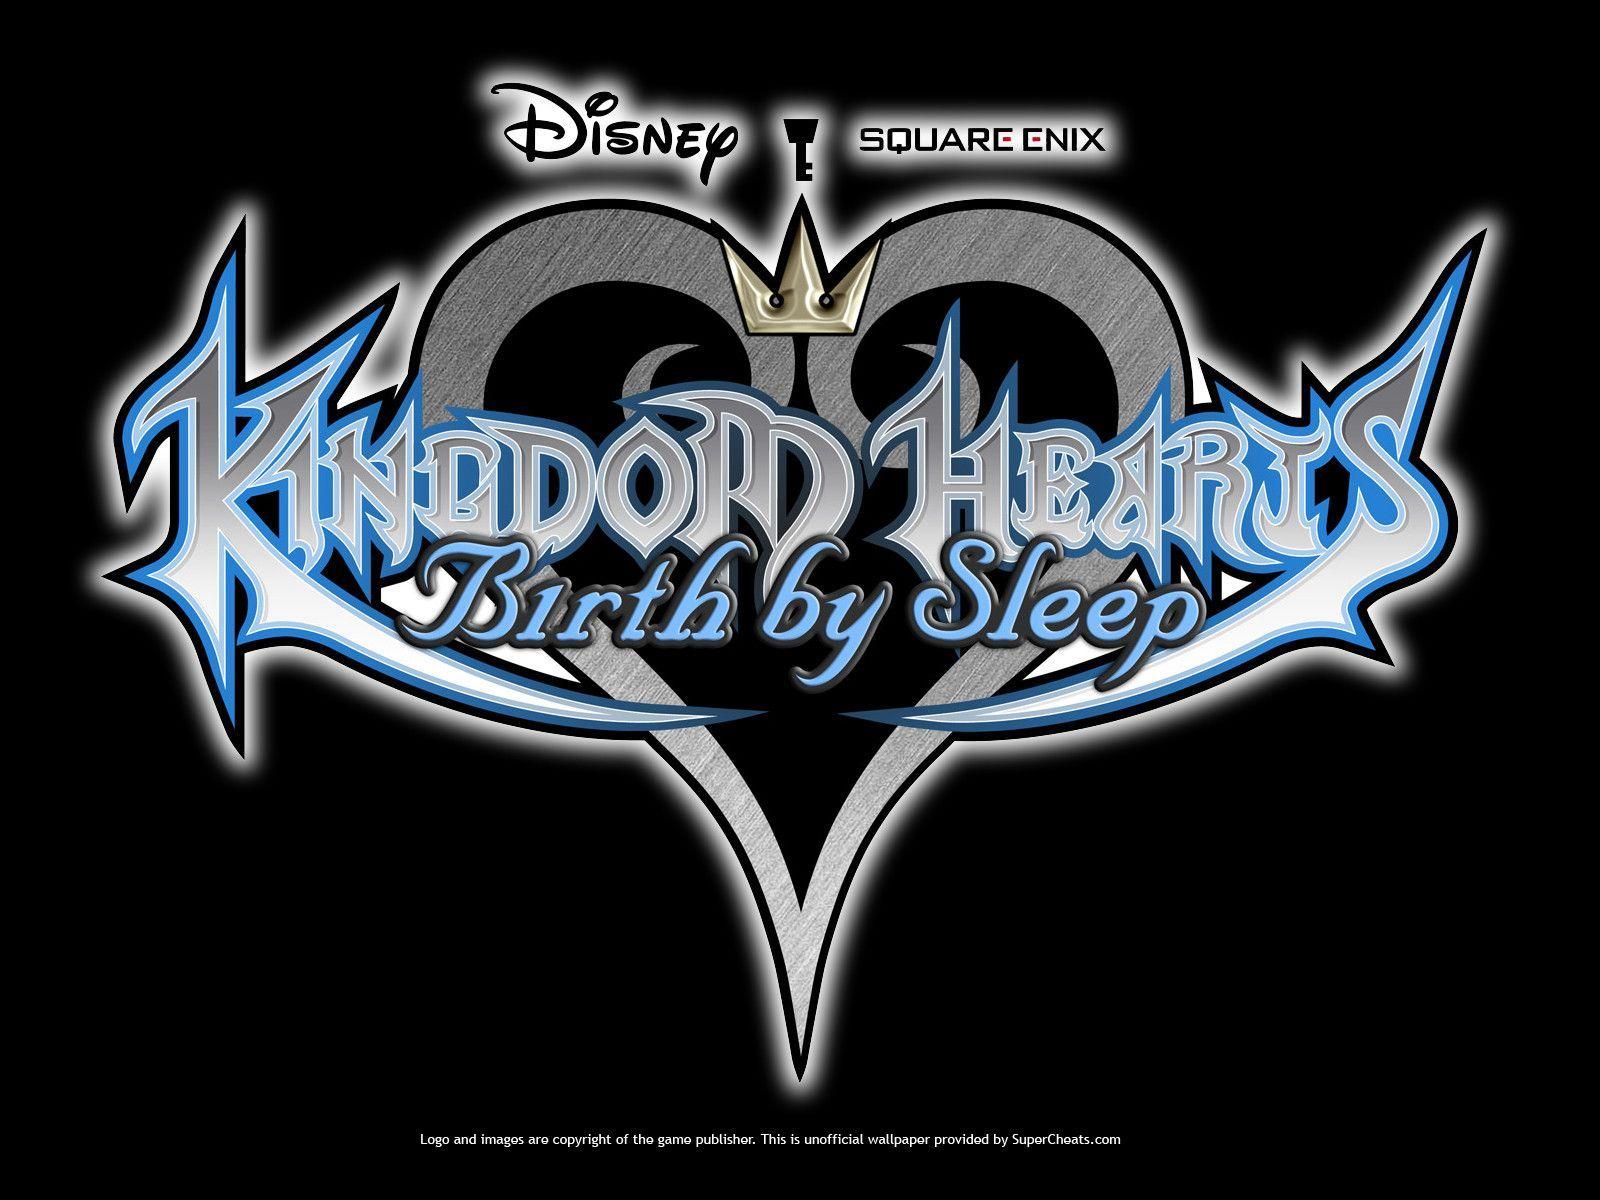 Kingdom Hearts Birth By Sleep Wallpaper For Desktop - Kingdom Of Hearts Mickey , HD Wallpaper & Backgrounds